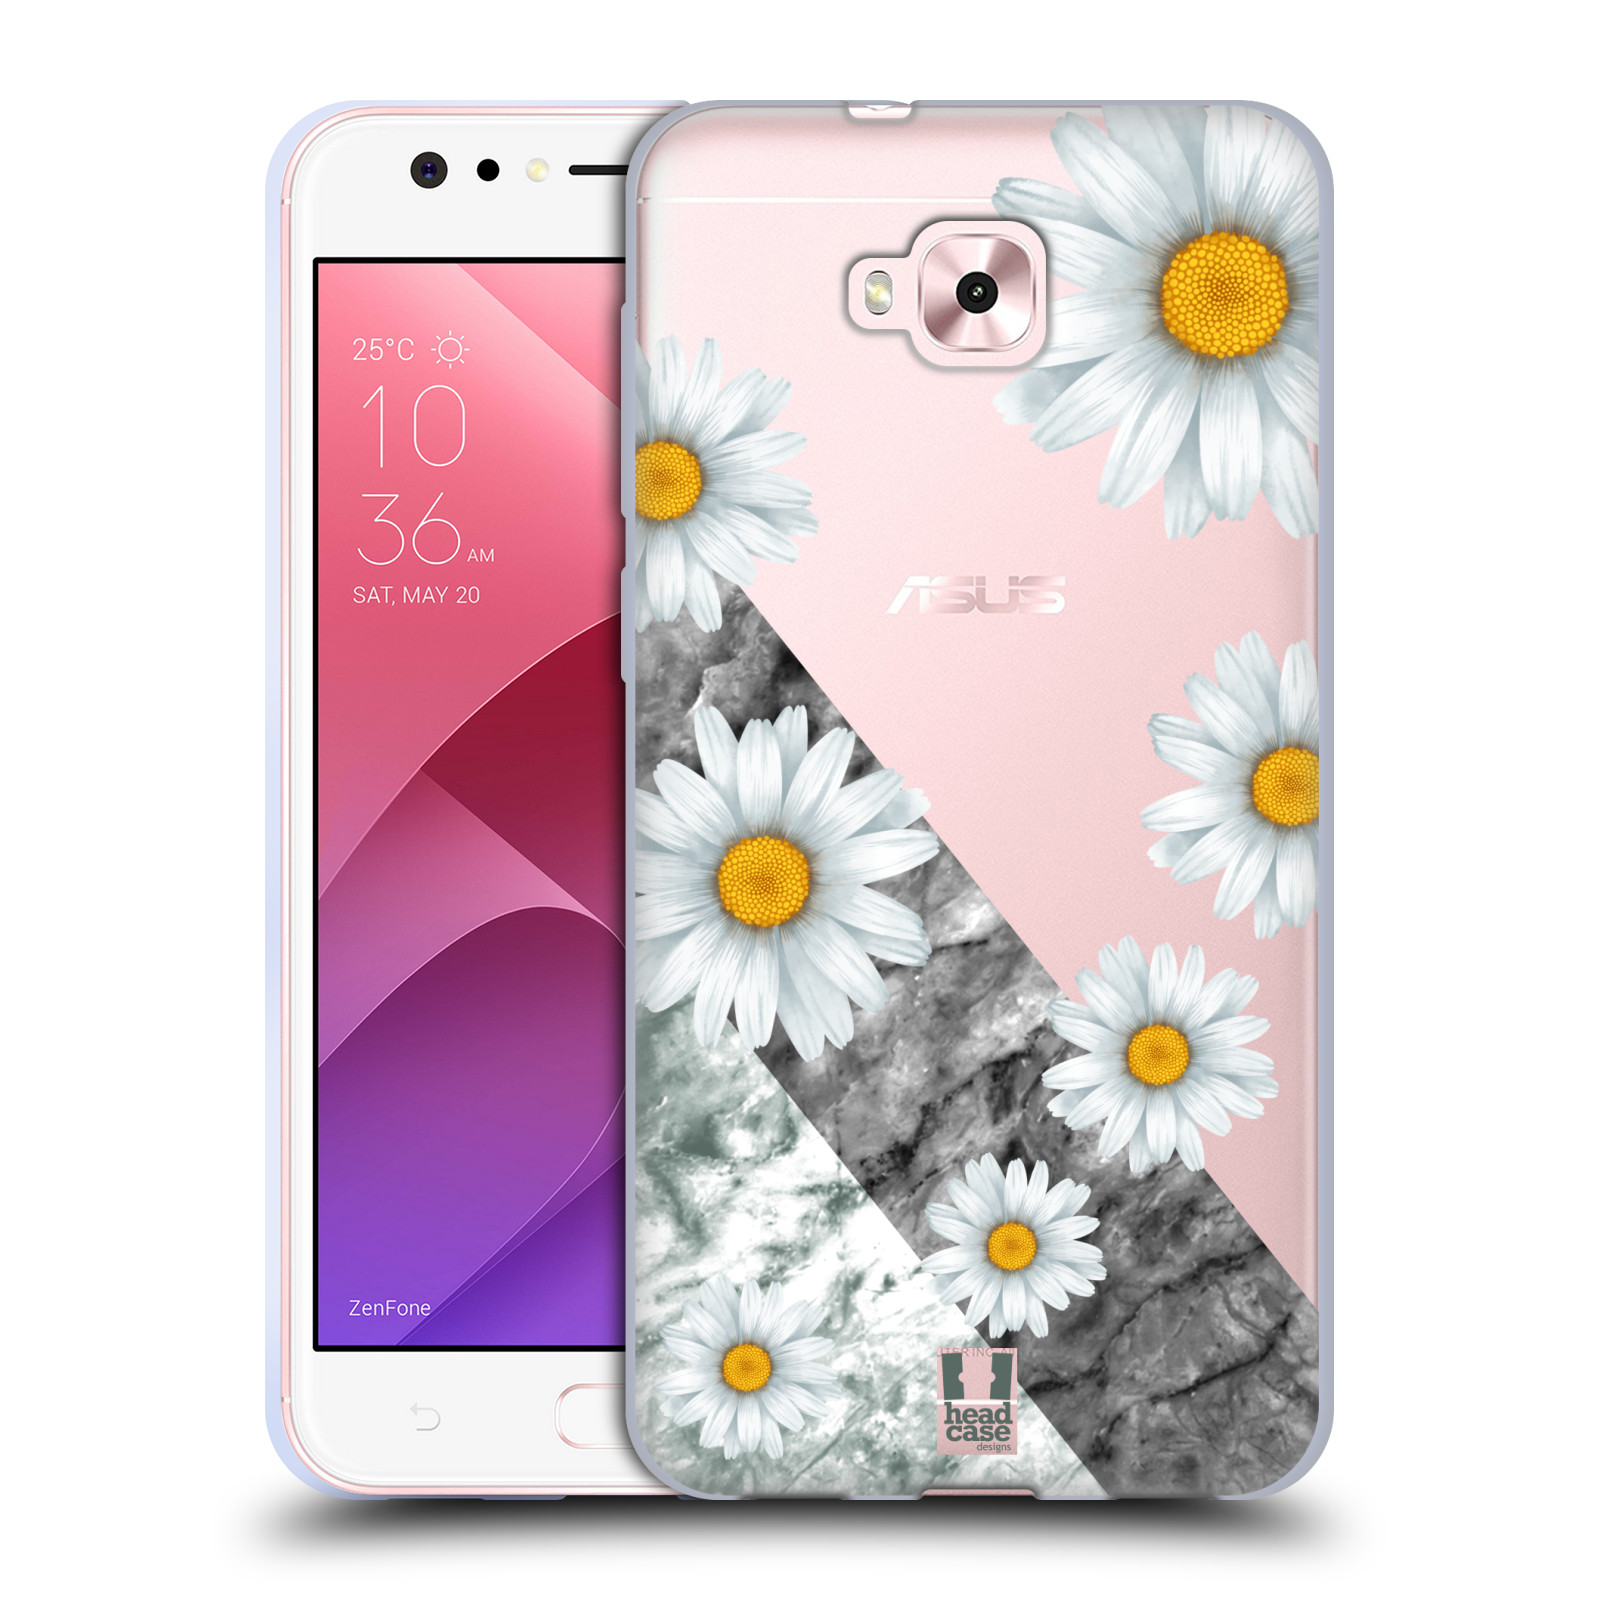 Silikonové pouzdro na mobil Asus Zenfone 4 Selfie ZD553KL - Head Case - Kopretiny a mramor